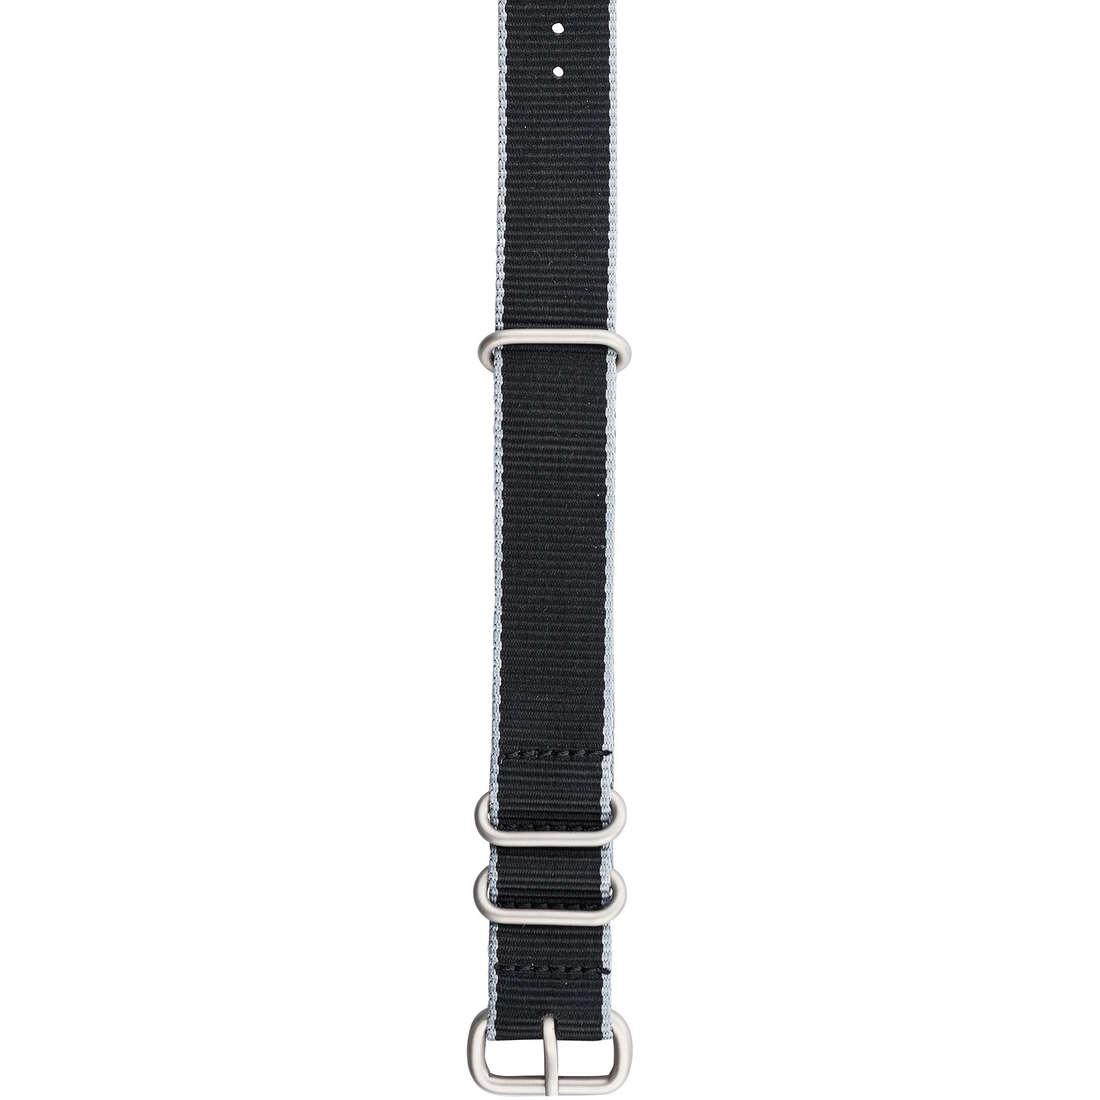 orologio cinturino orologio uomo Brosway W2 WW2c29